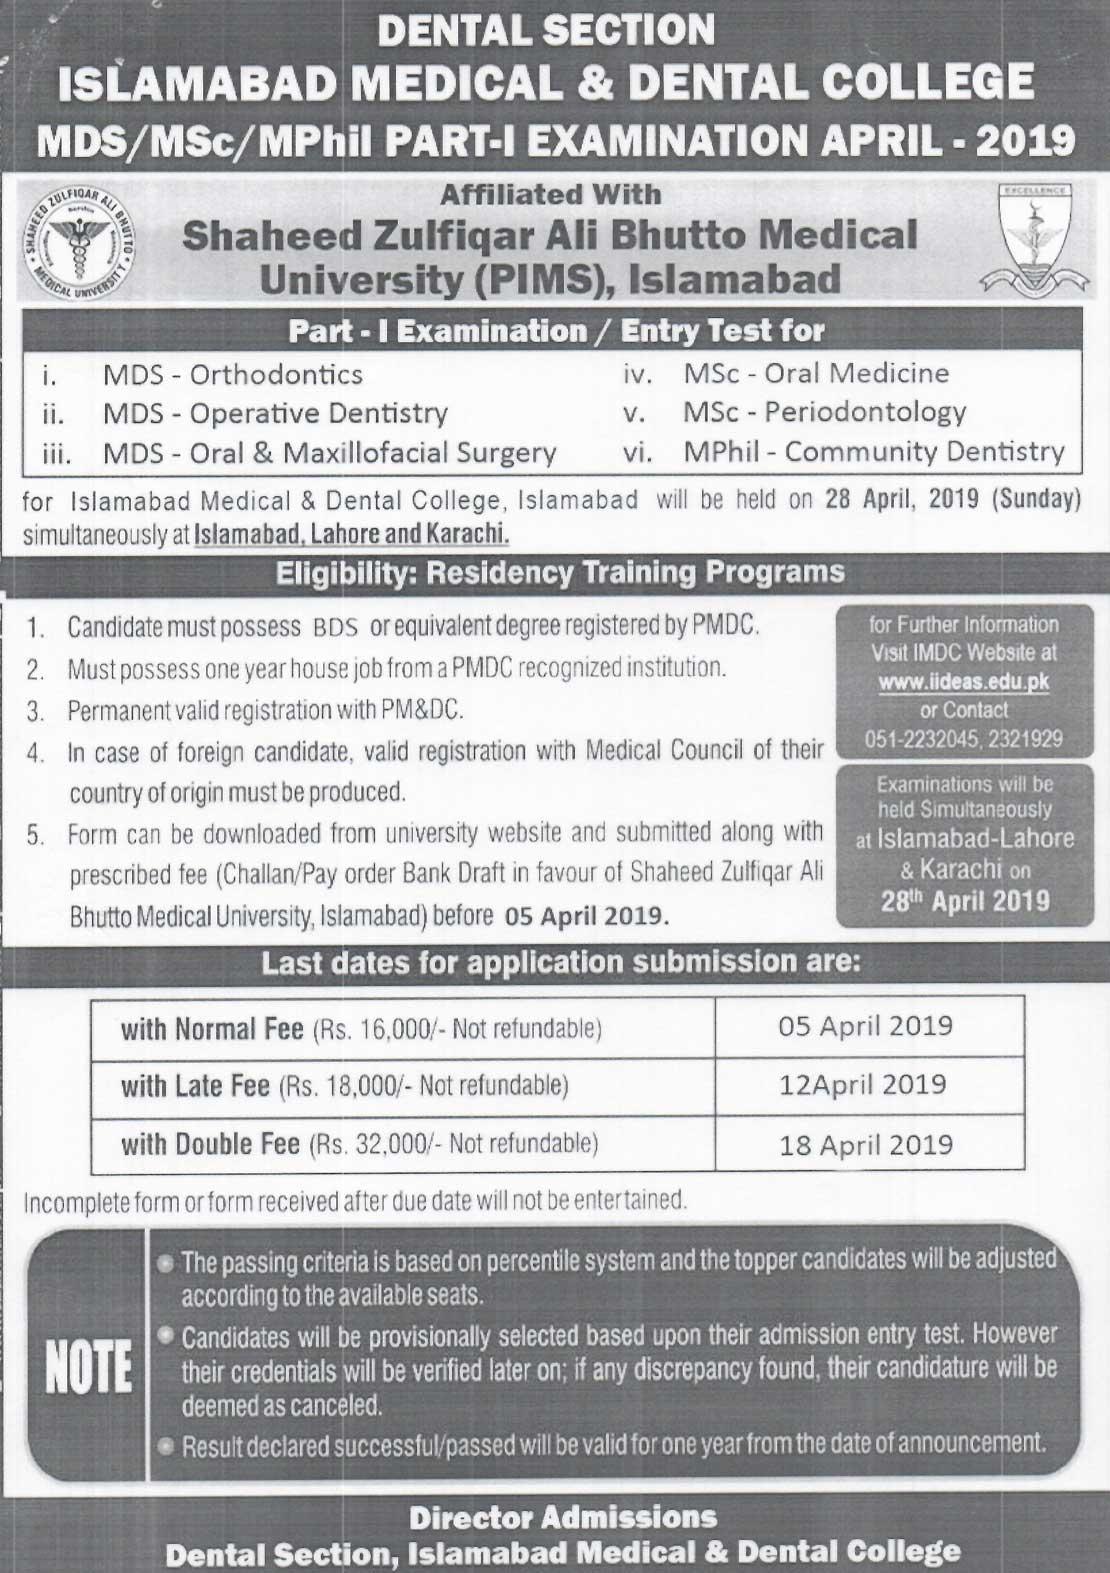 IMDC MDS/MSc/MPhil Part-I Examination April 2019